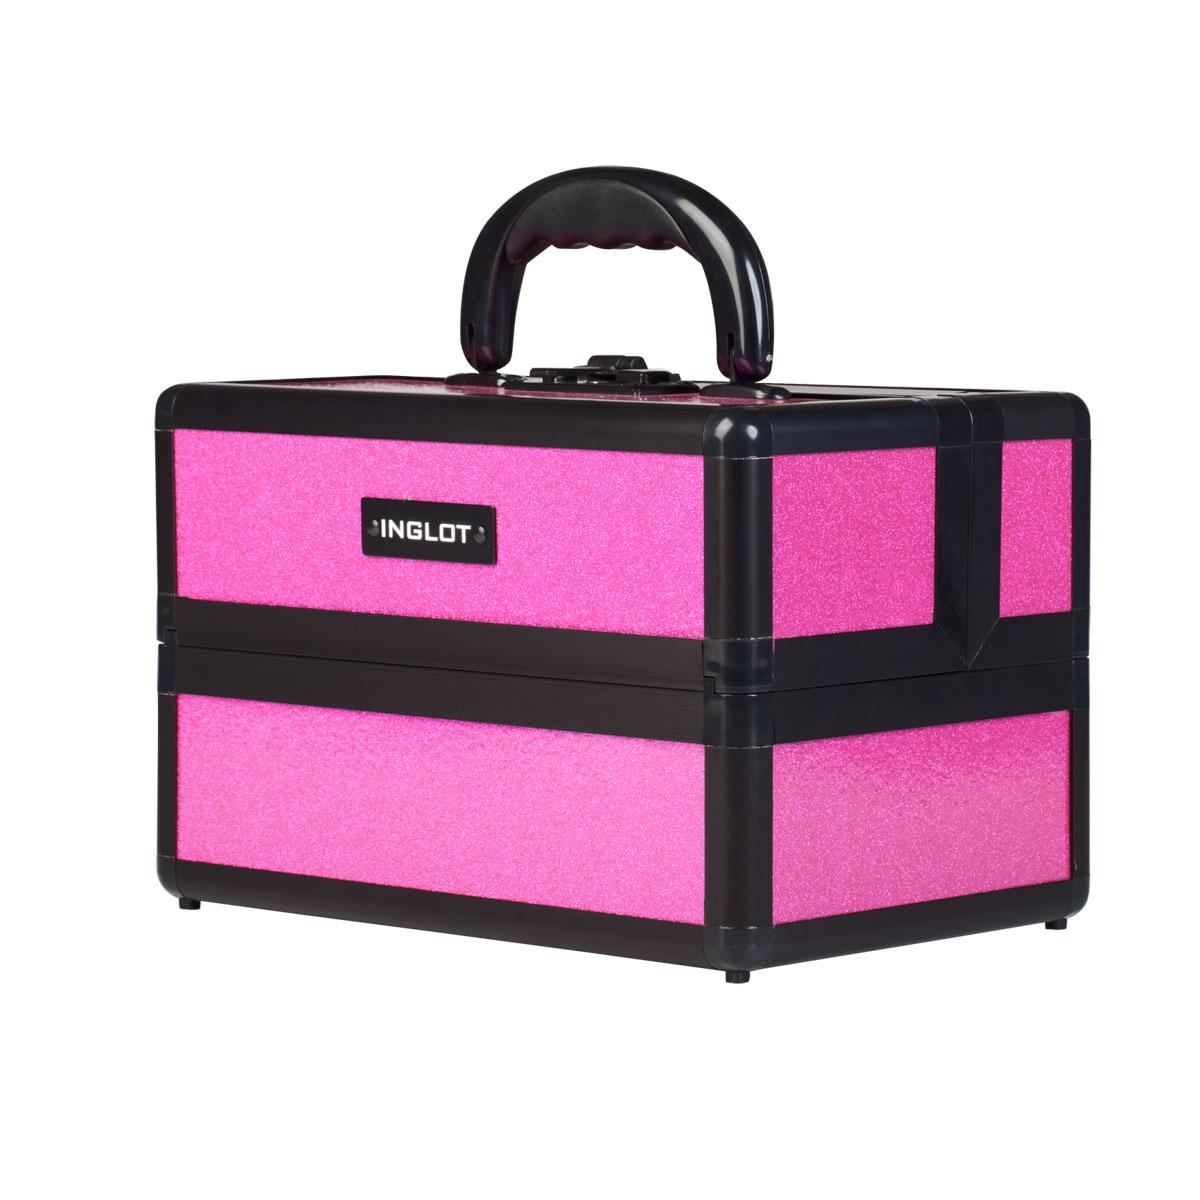 aed14675fb95 Sminkes bőrönd Shiny Pink Small (KC-MSM01) - INGLOT Magyarország